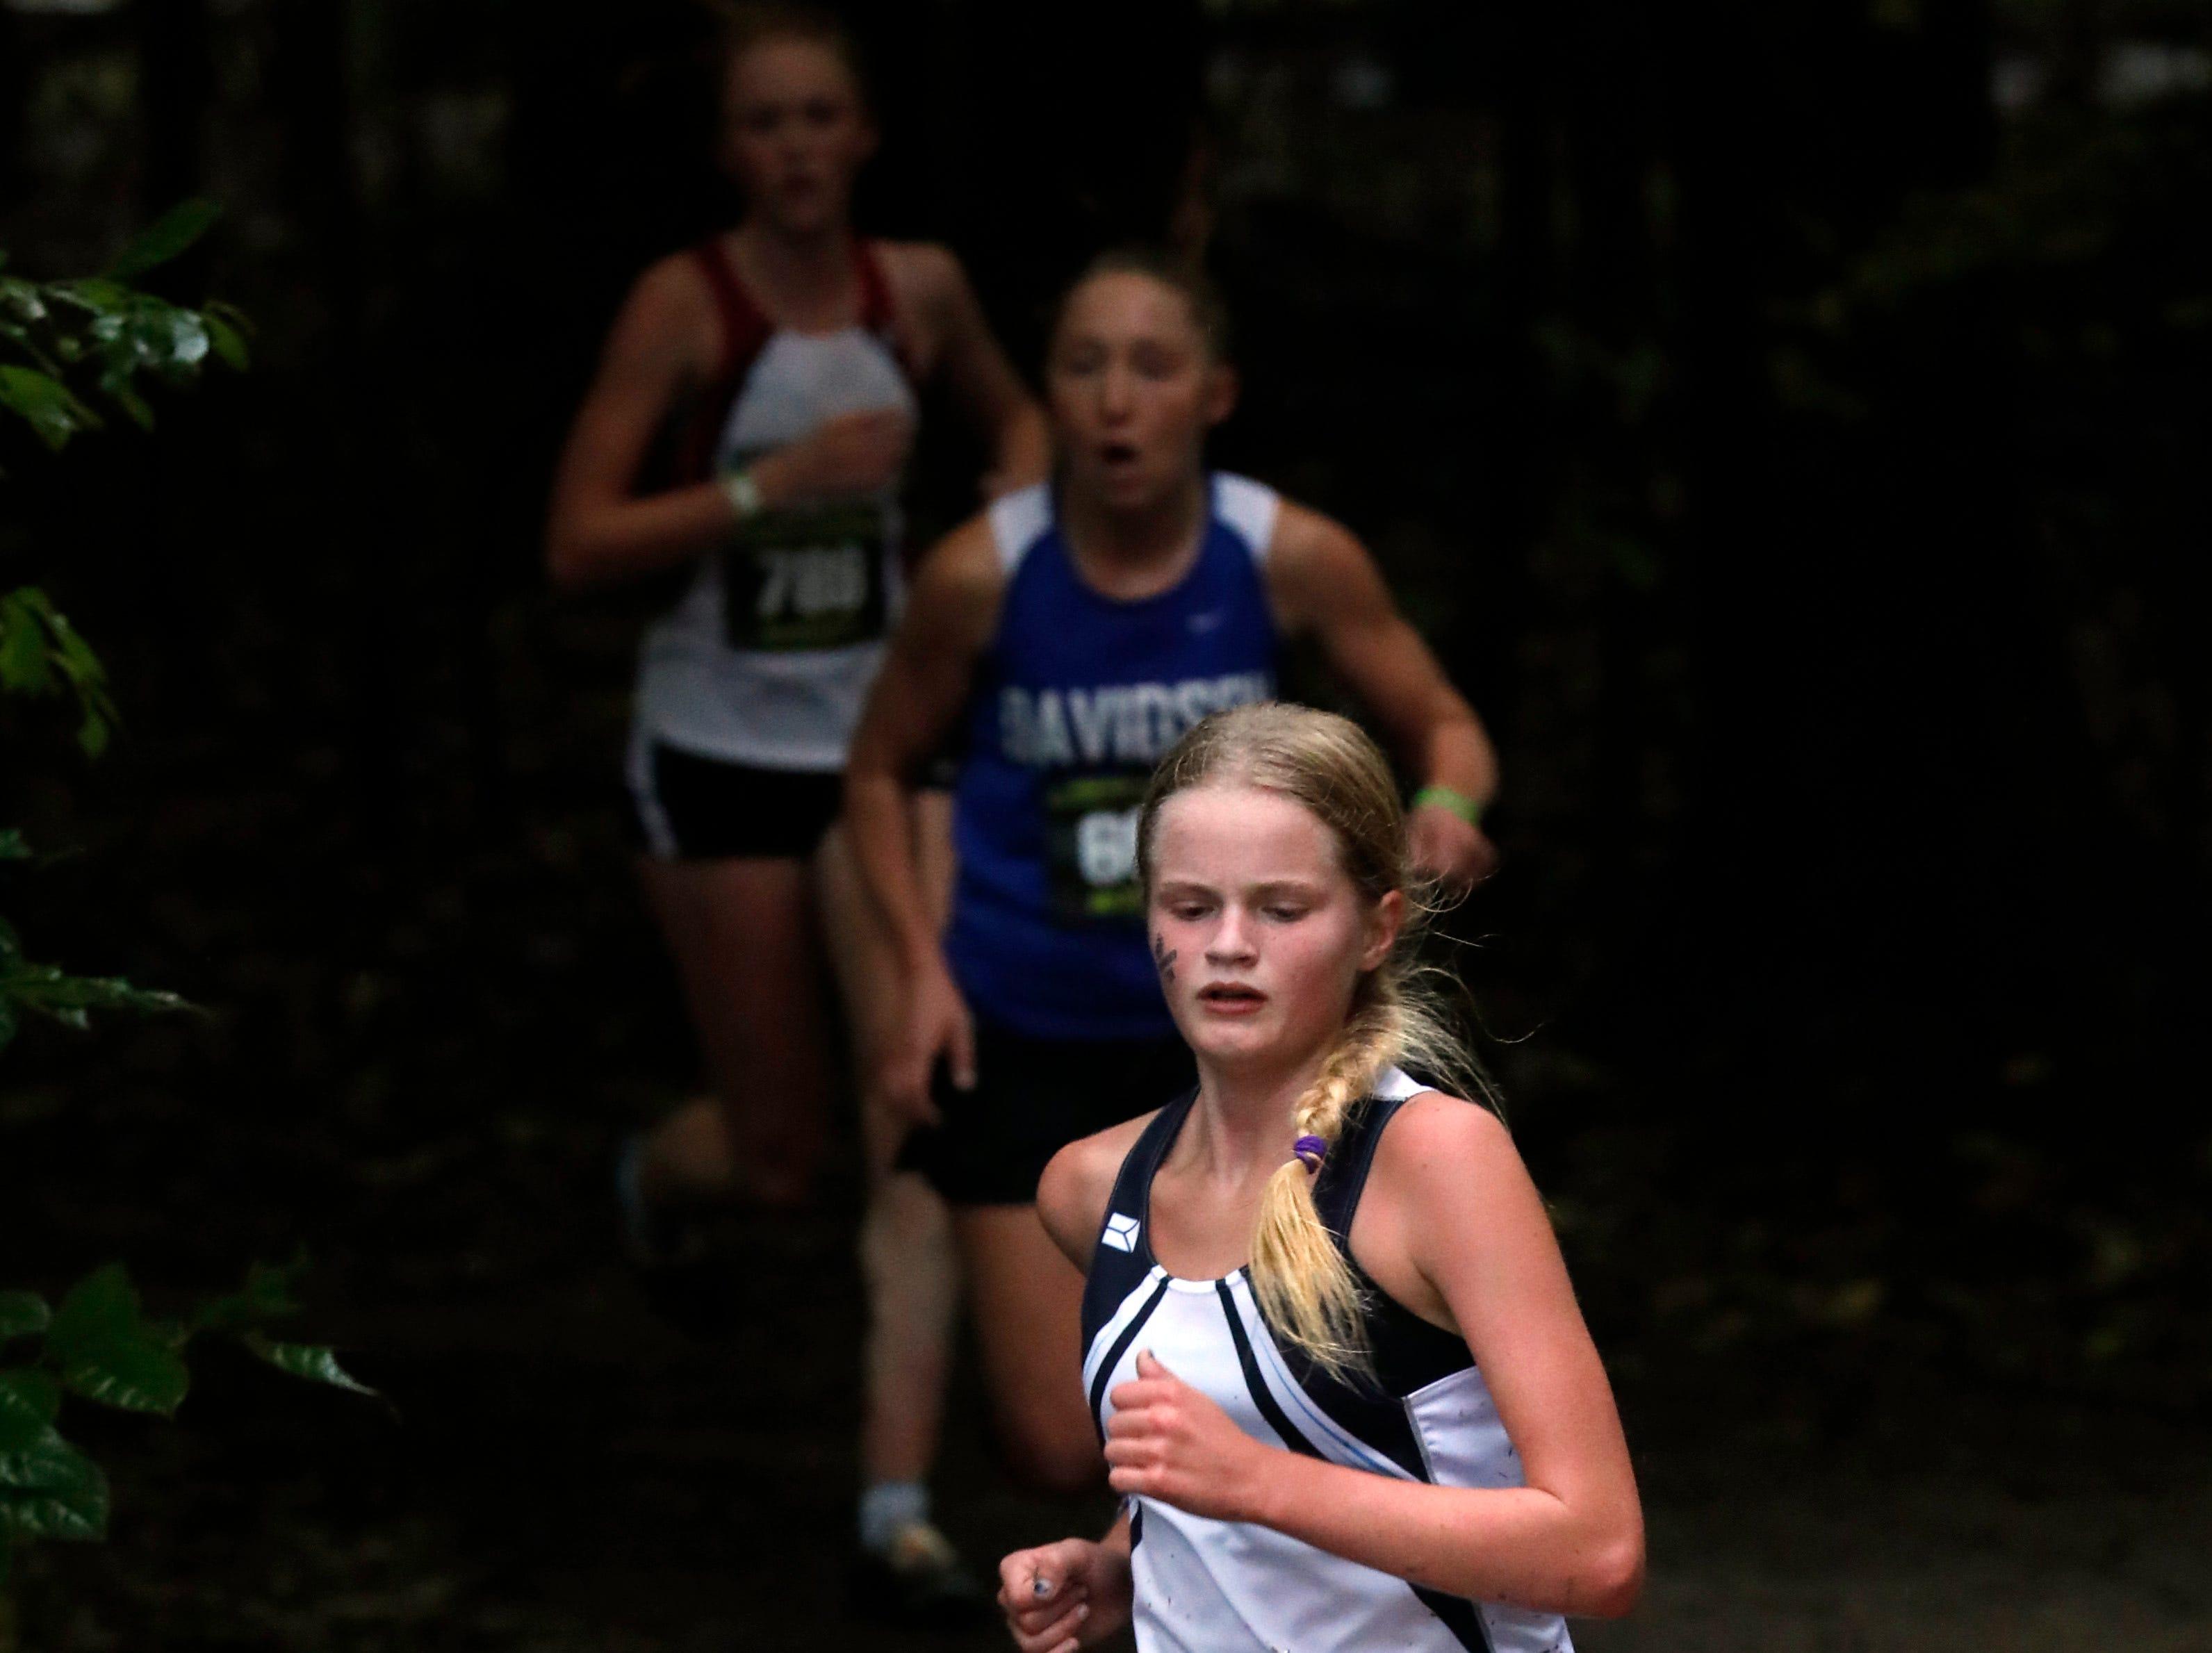 Granville's Dylan Kretchmar runs in the Regional Cross Country meet Saturday, Oct. 27, 2018, at Pickerington North High School in Pickerington.